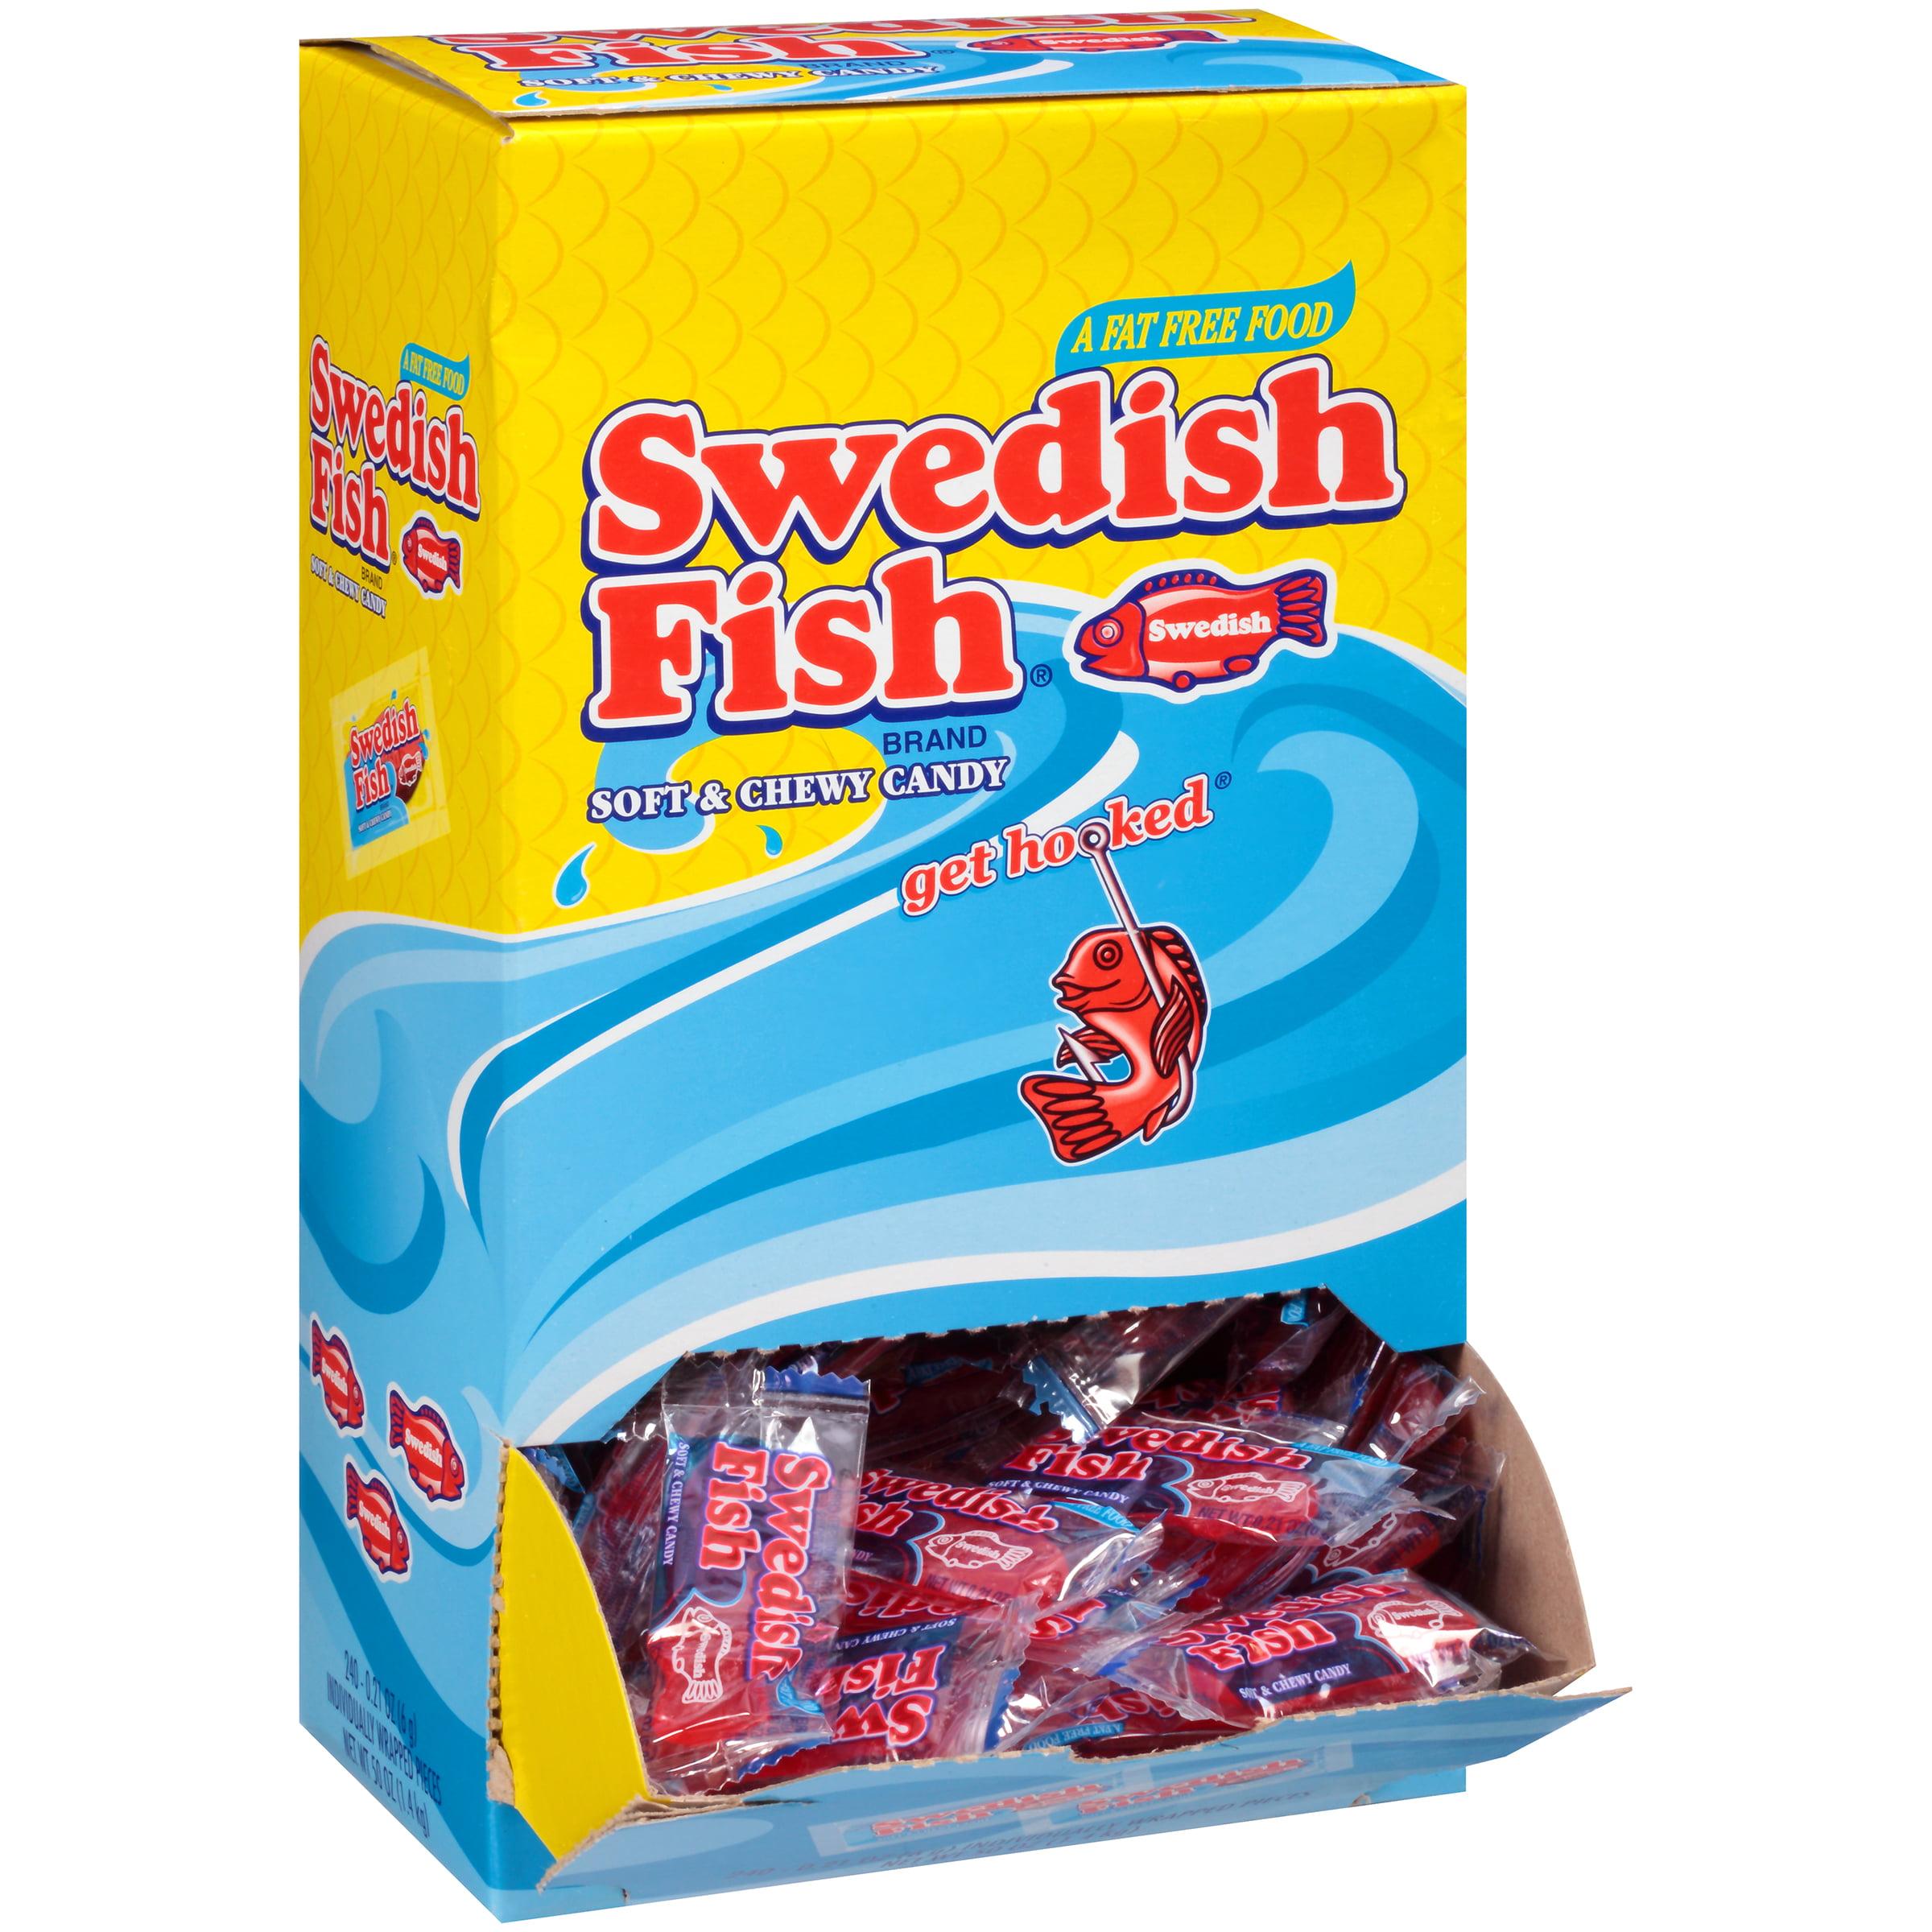 Swedish Fish, Grab-and-Go Candy Snacks Box, 240 Ct